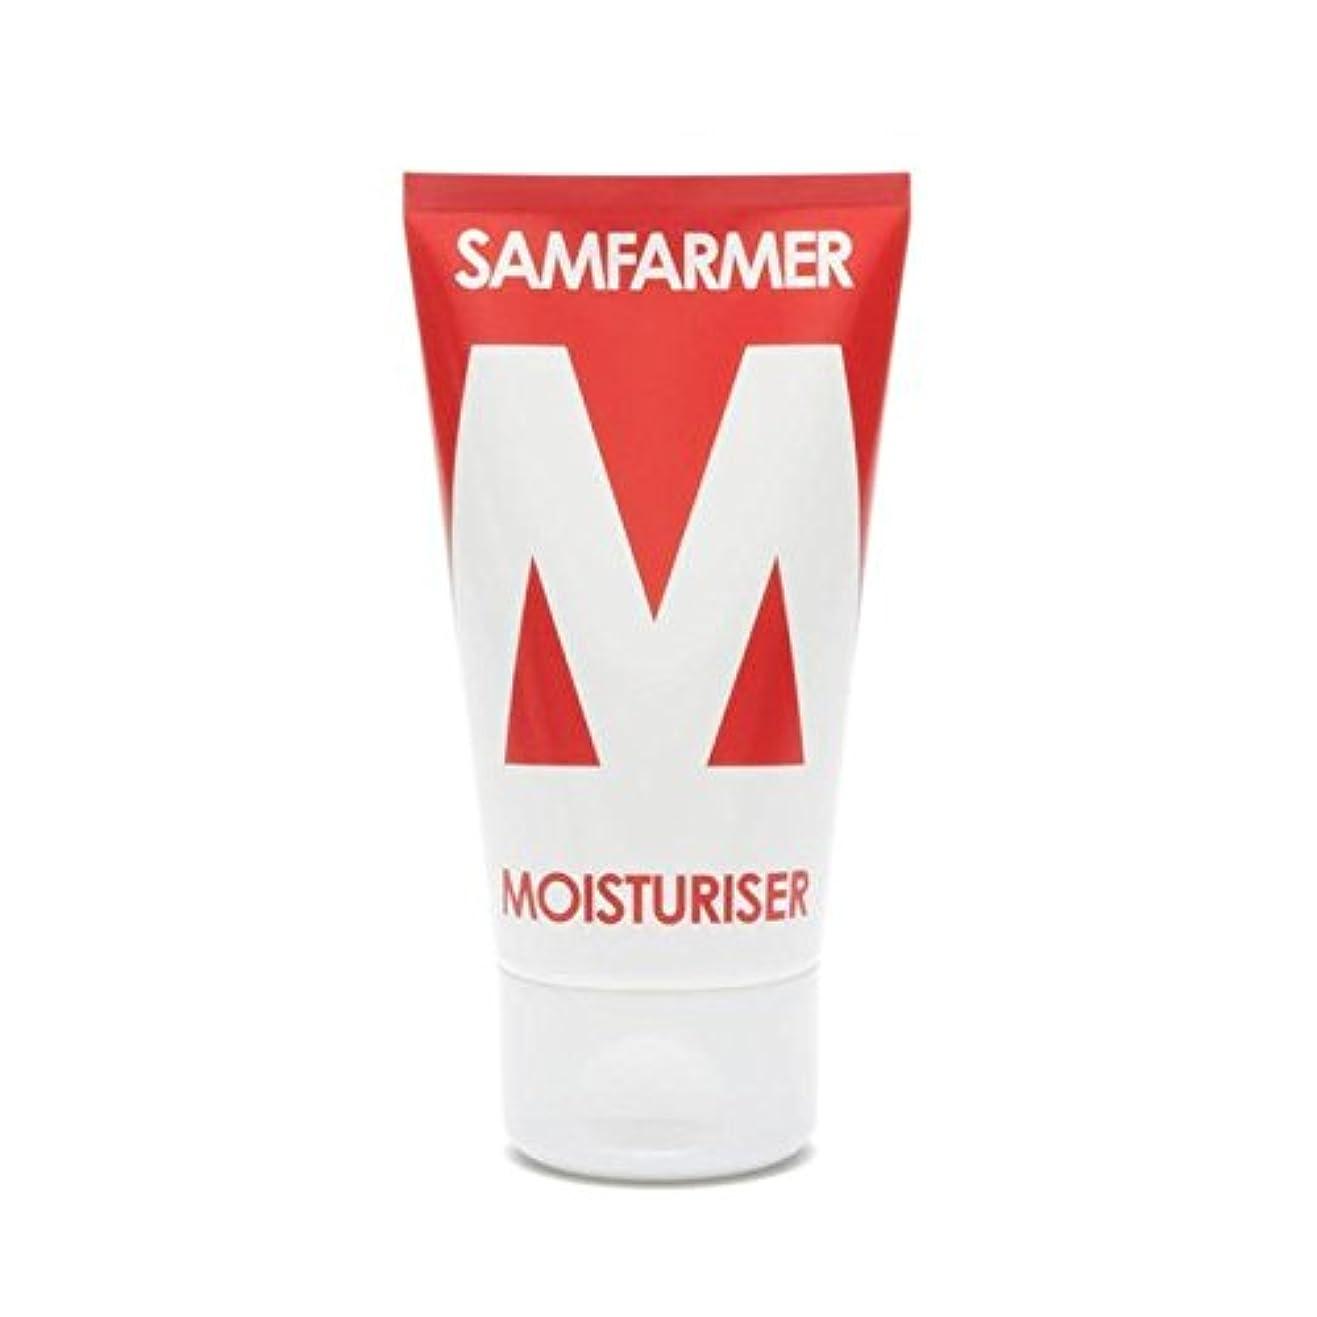 SAMFARMER Unisex Moisturiser 50ml (Pack of 6) - ユニセックス保湿50ミリリットル x6 [並行輸入品]